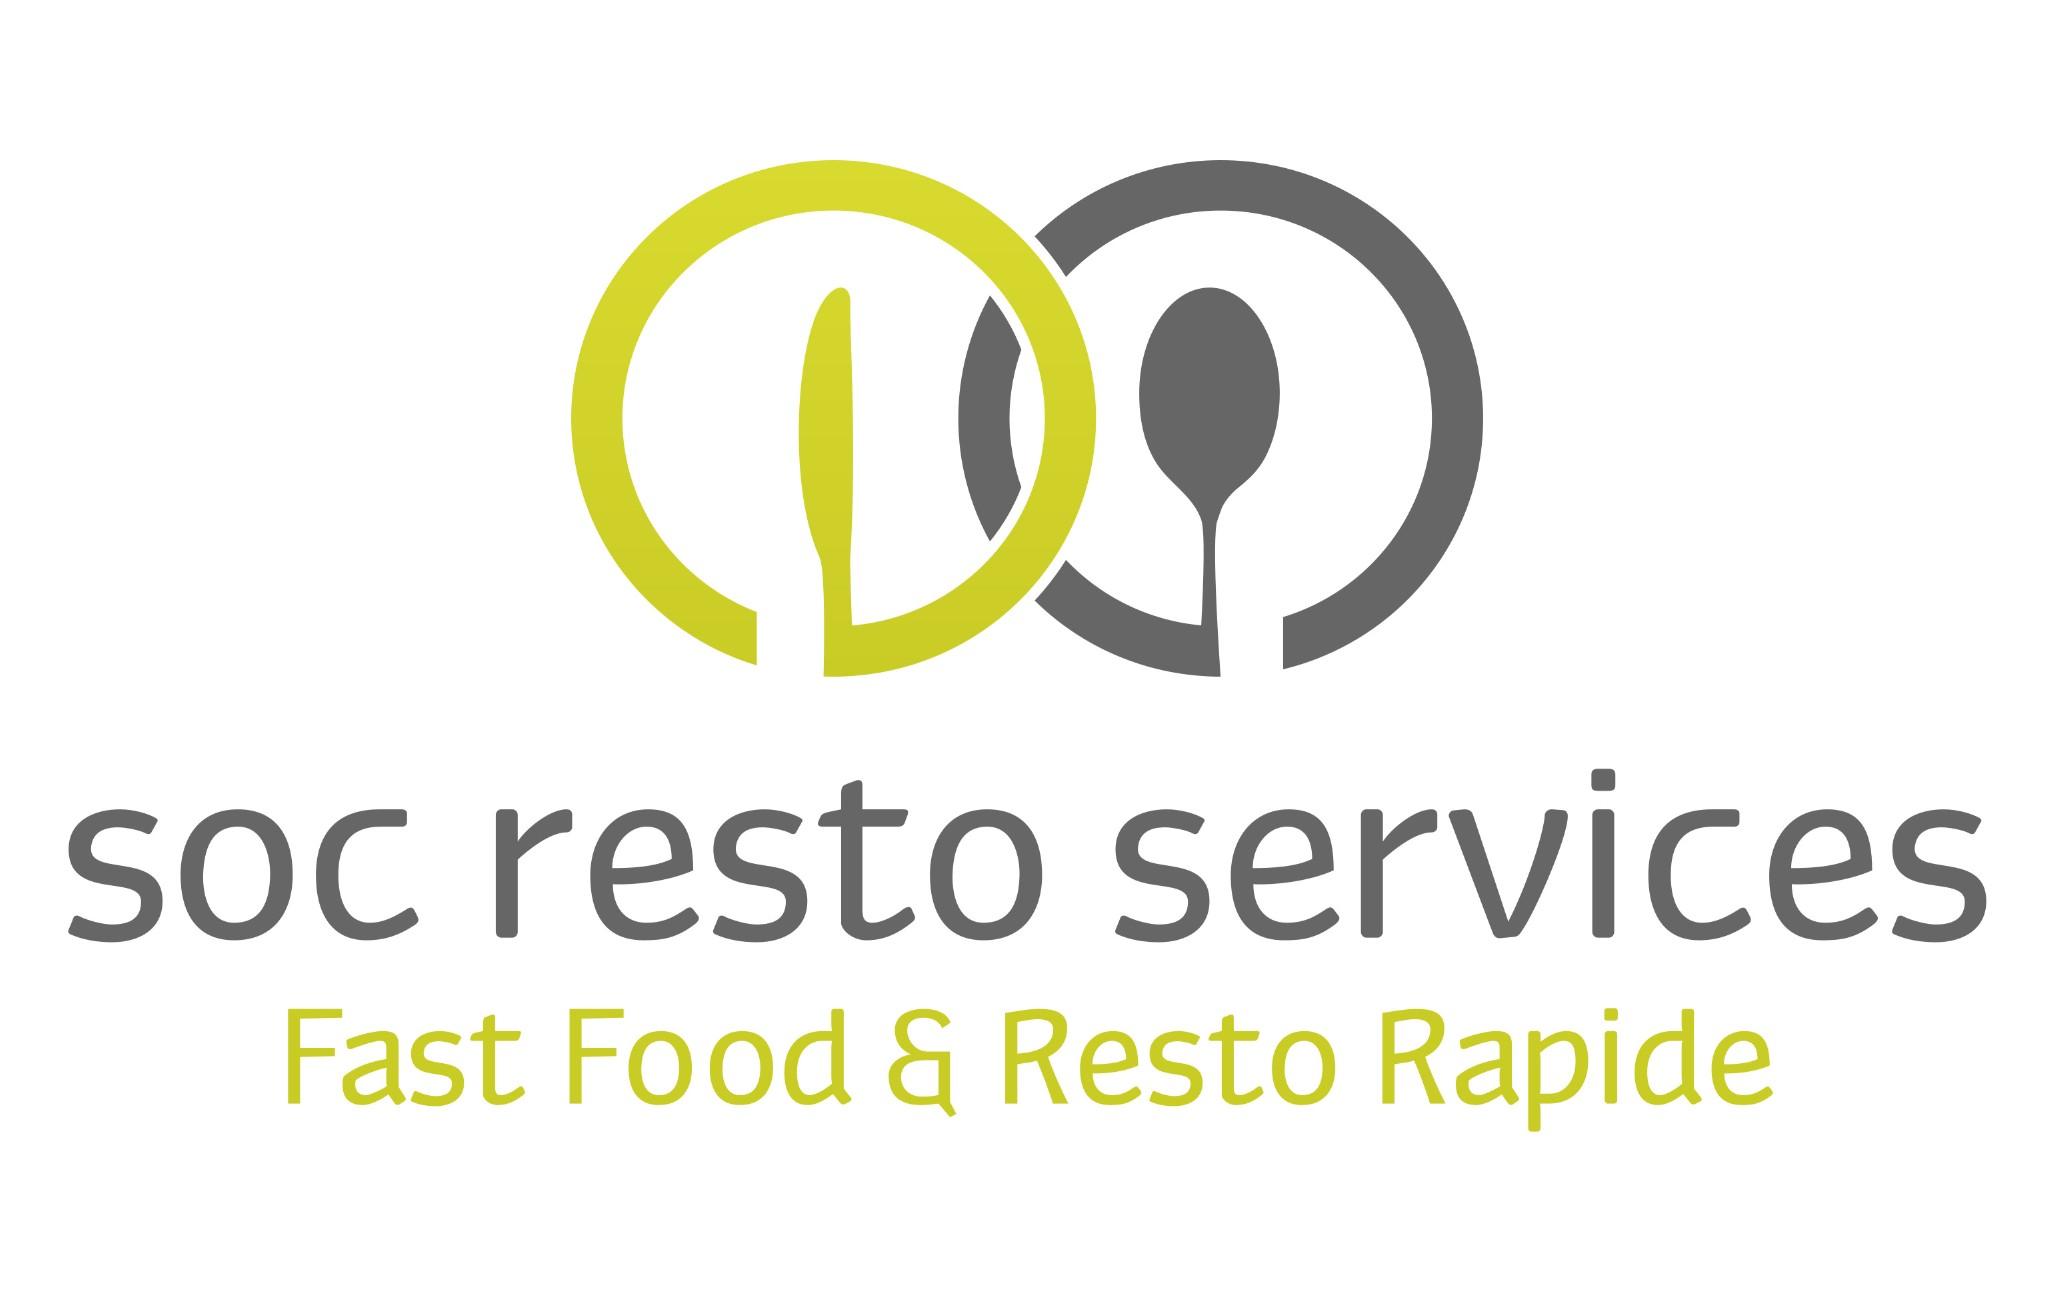 Grossiste Soc Resto Services